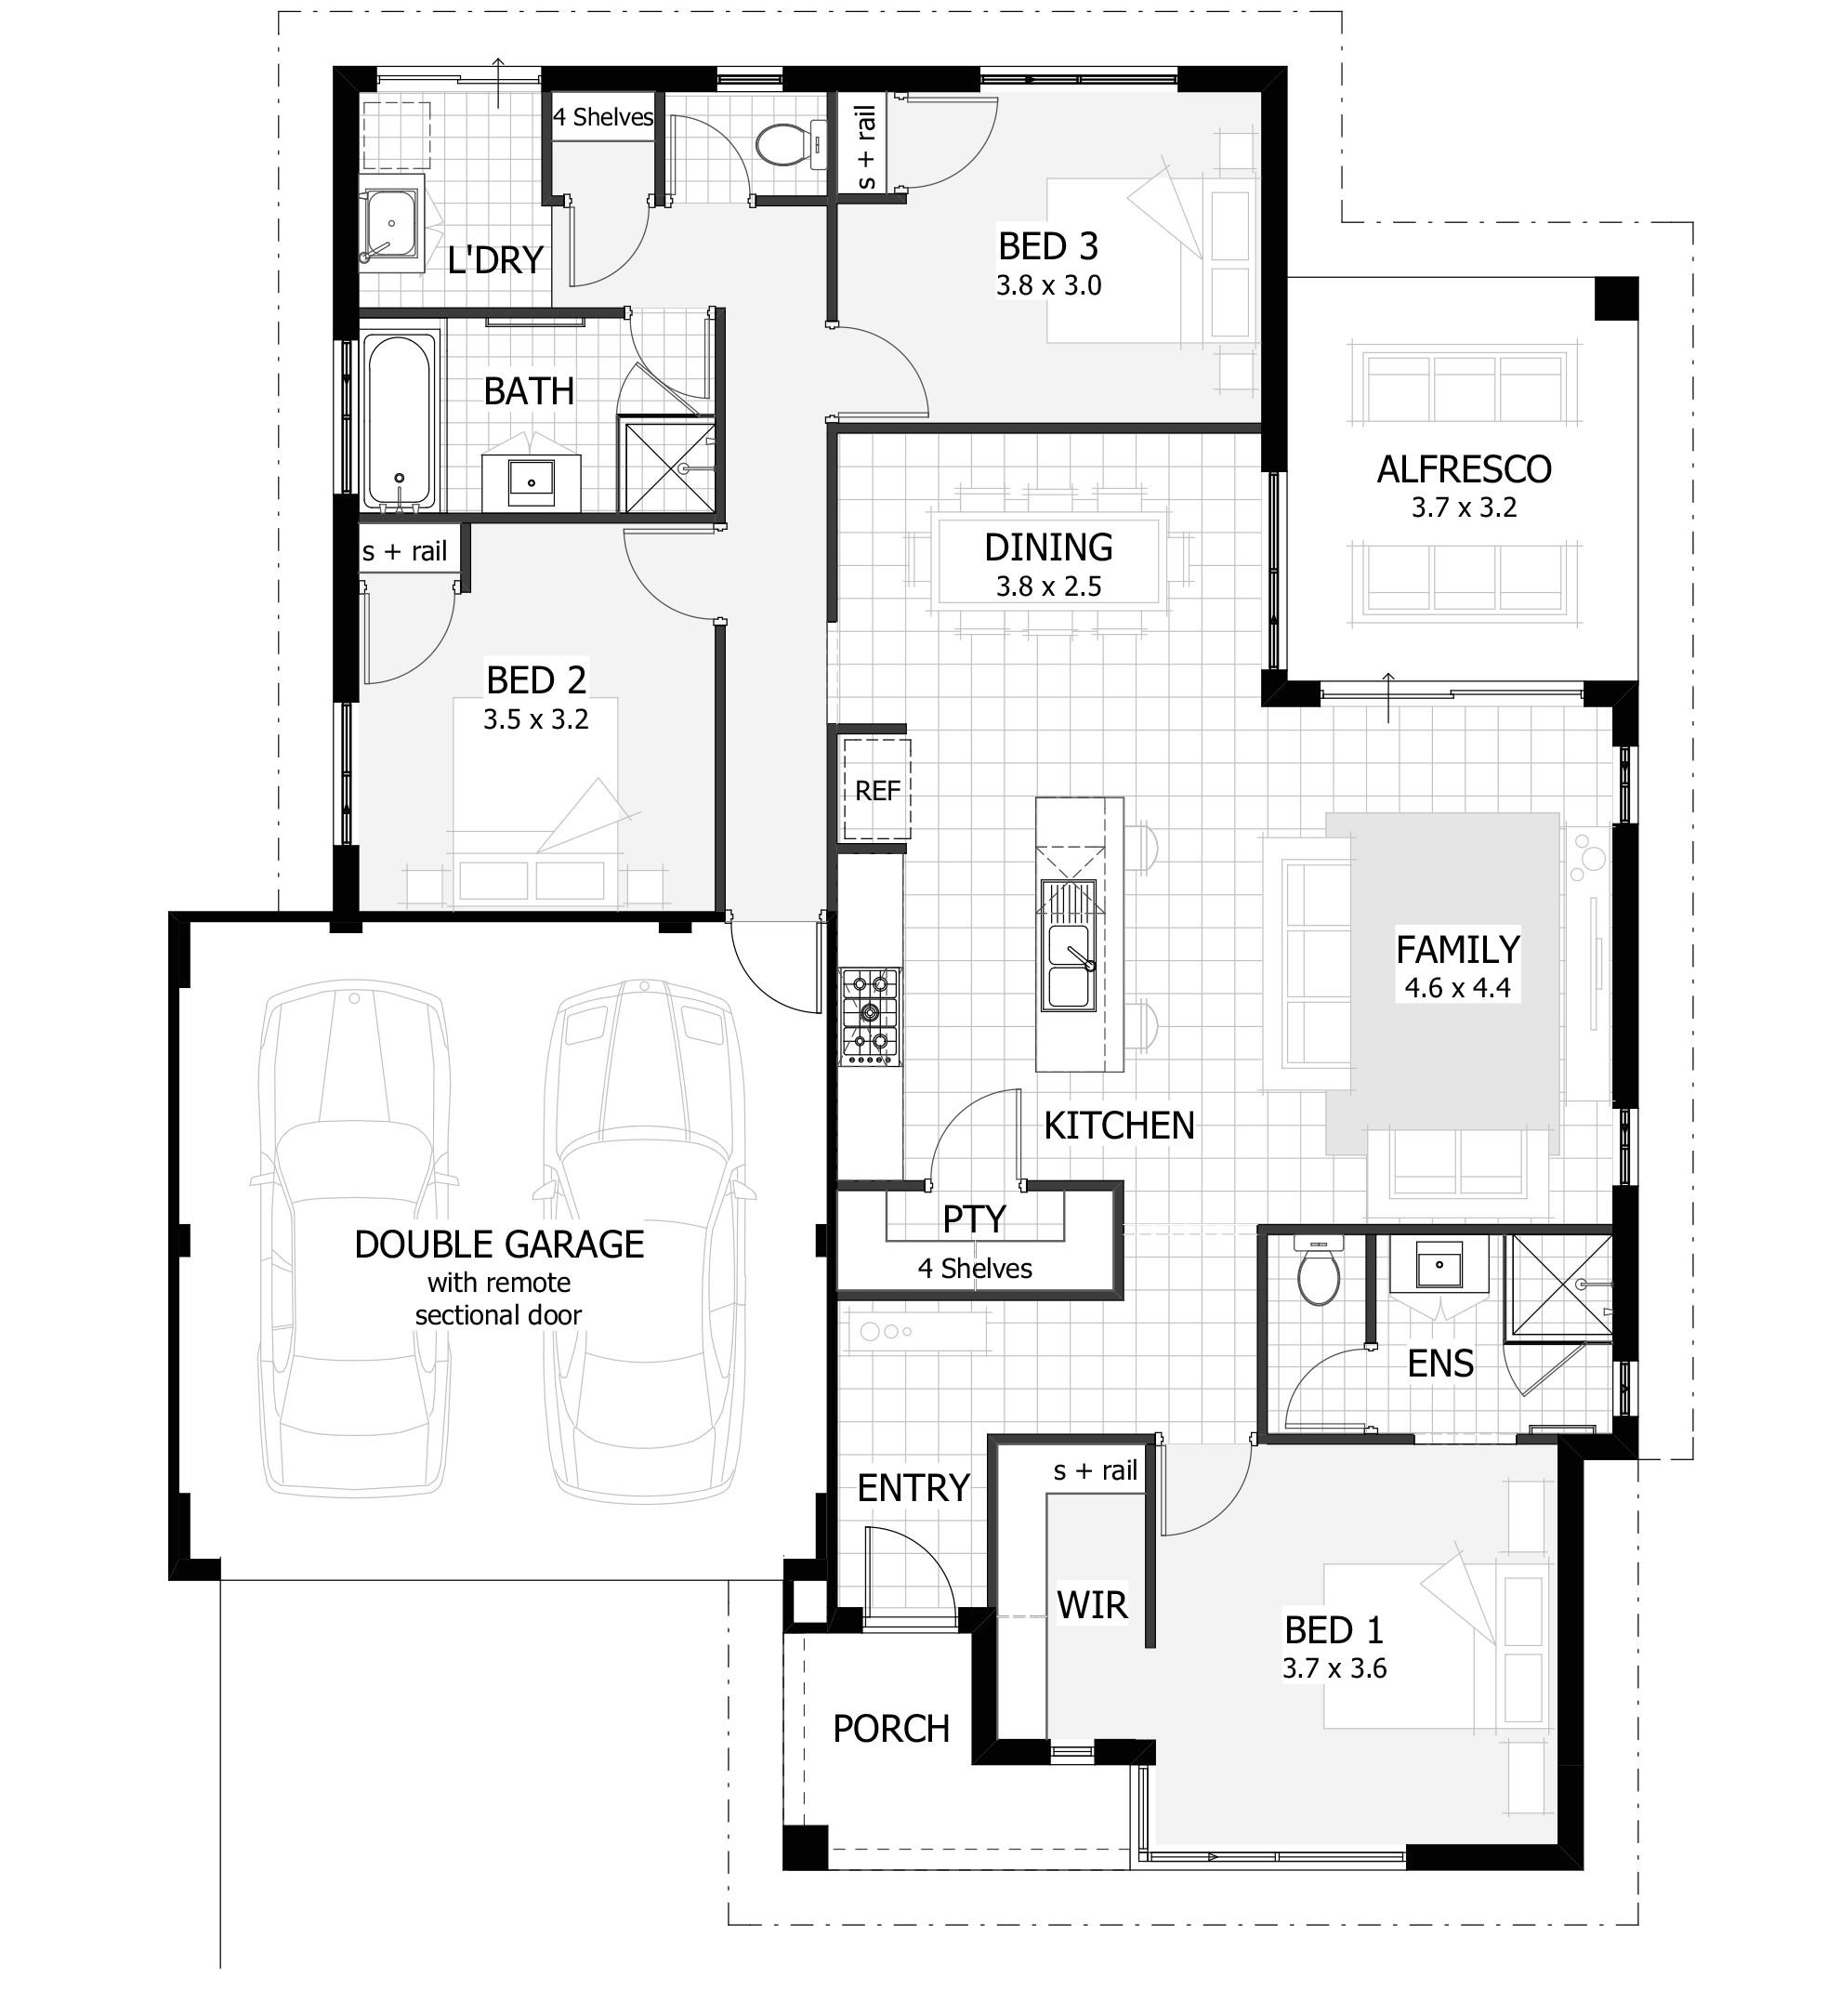 3 bedroom home designs plans